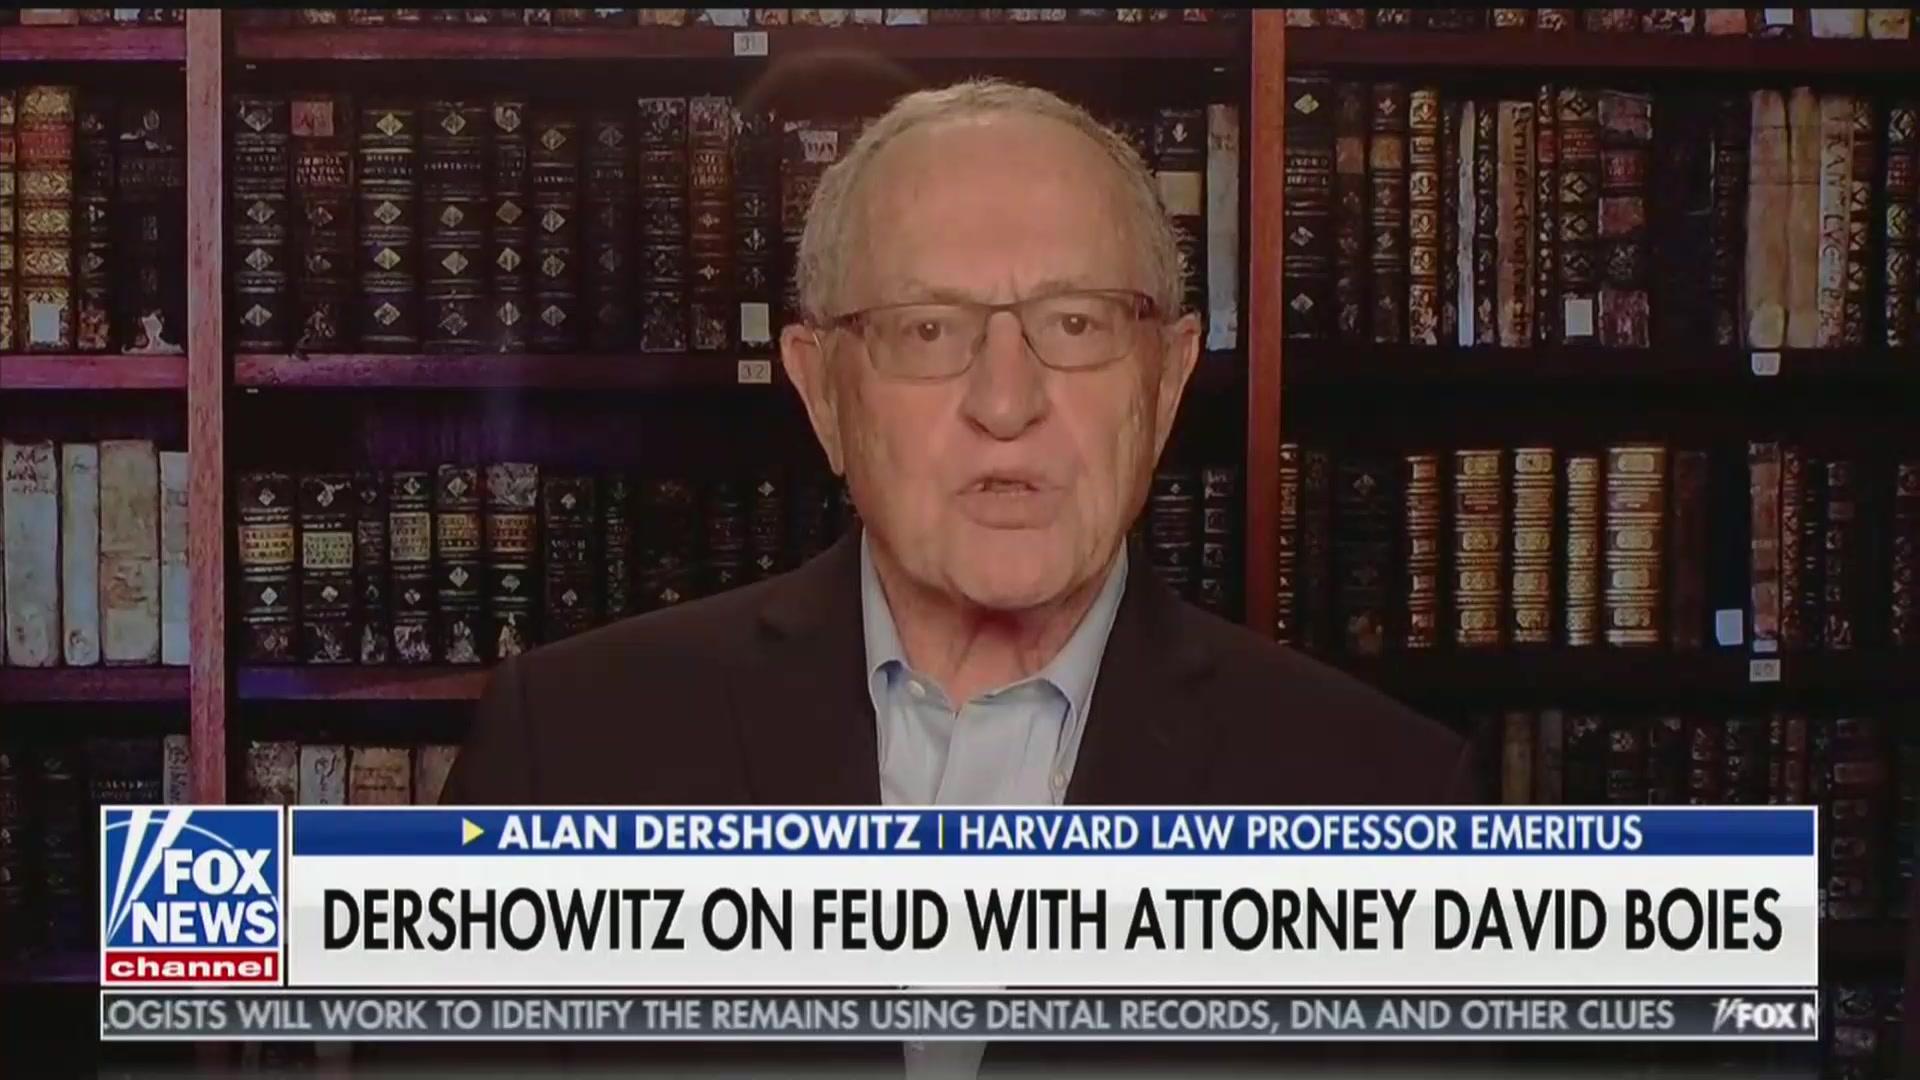 alan dershowitz sex scandal news in Walsall